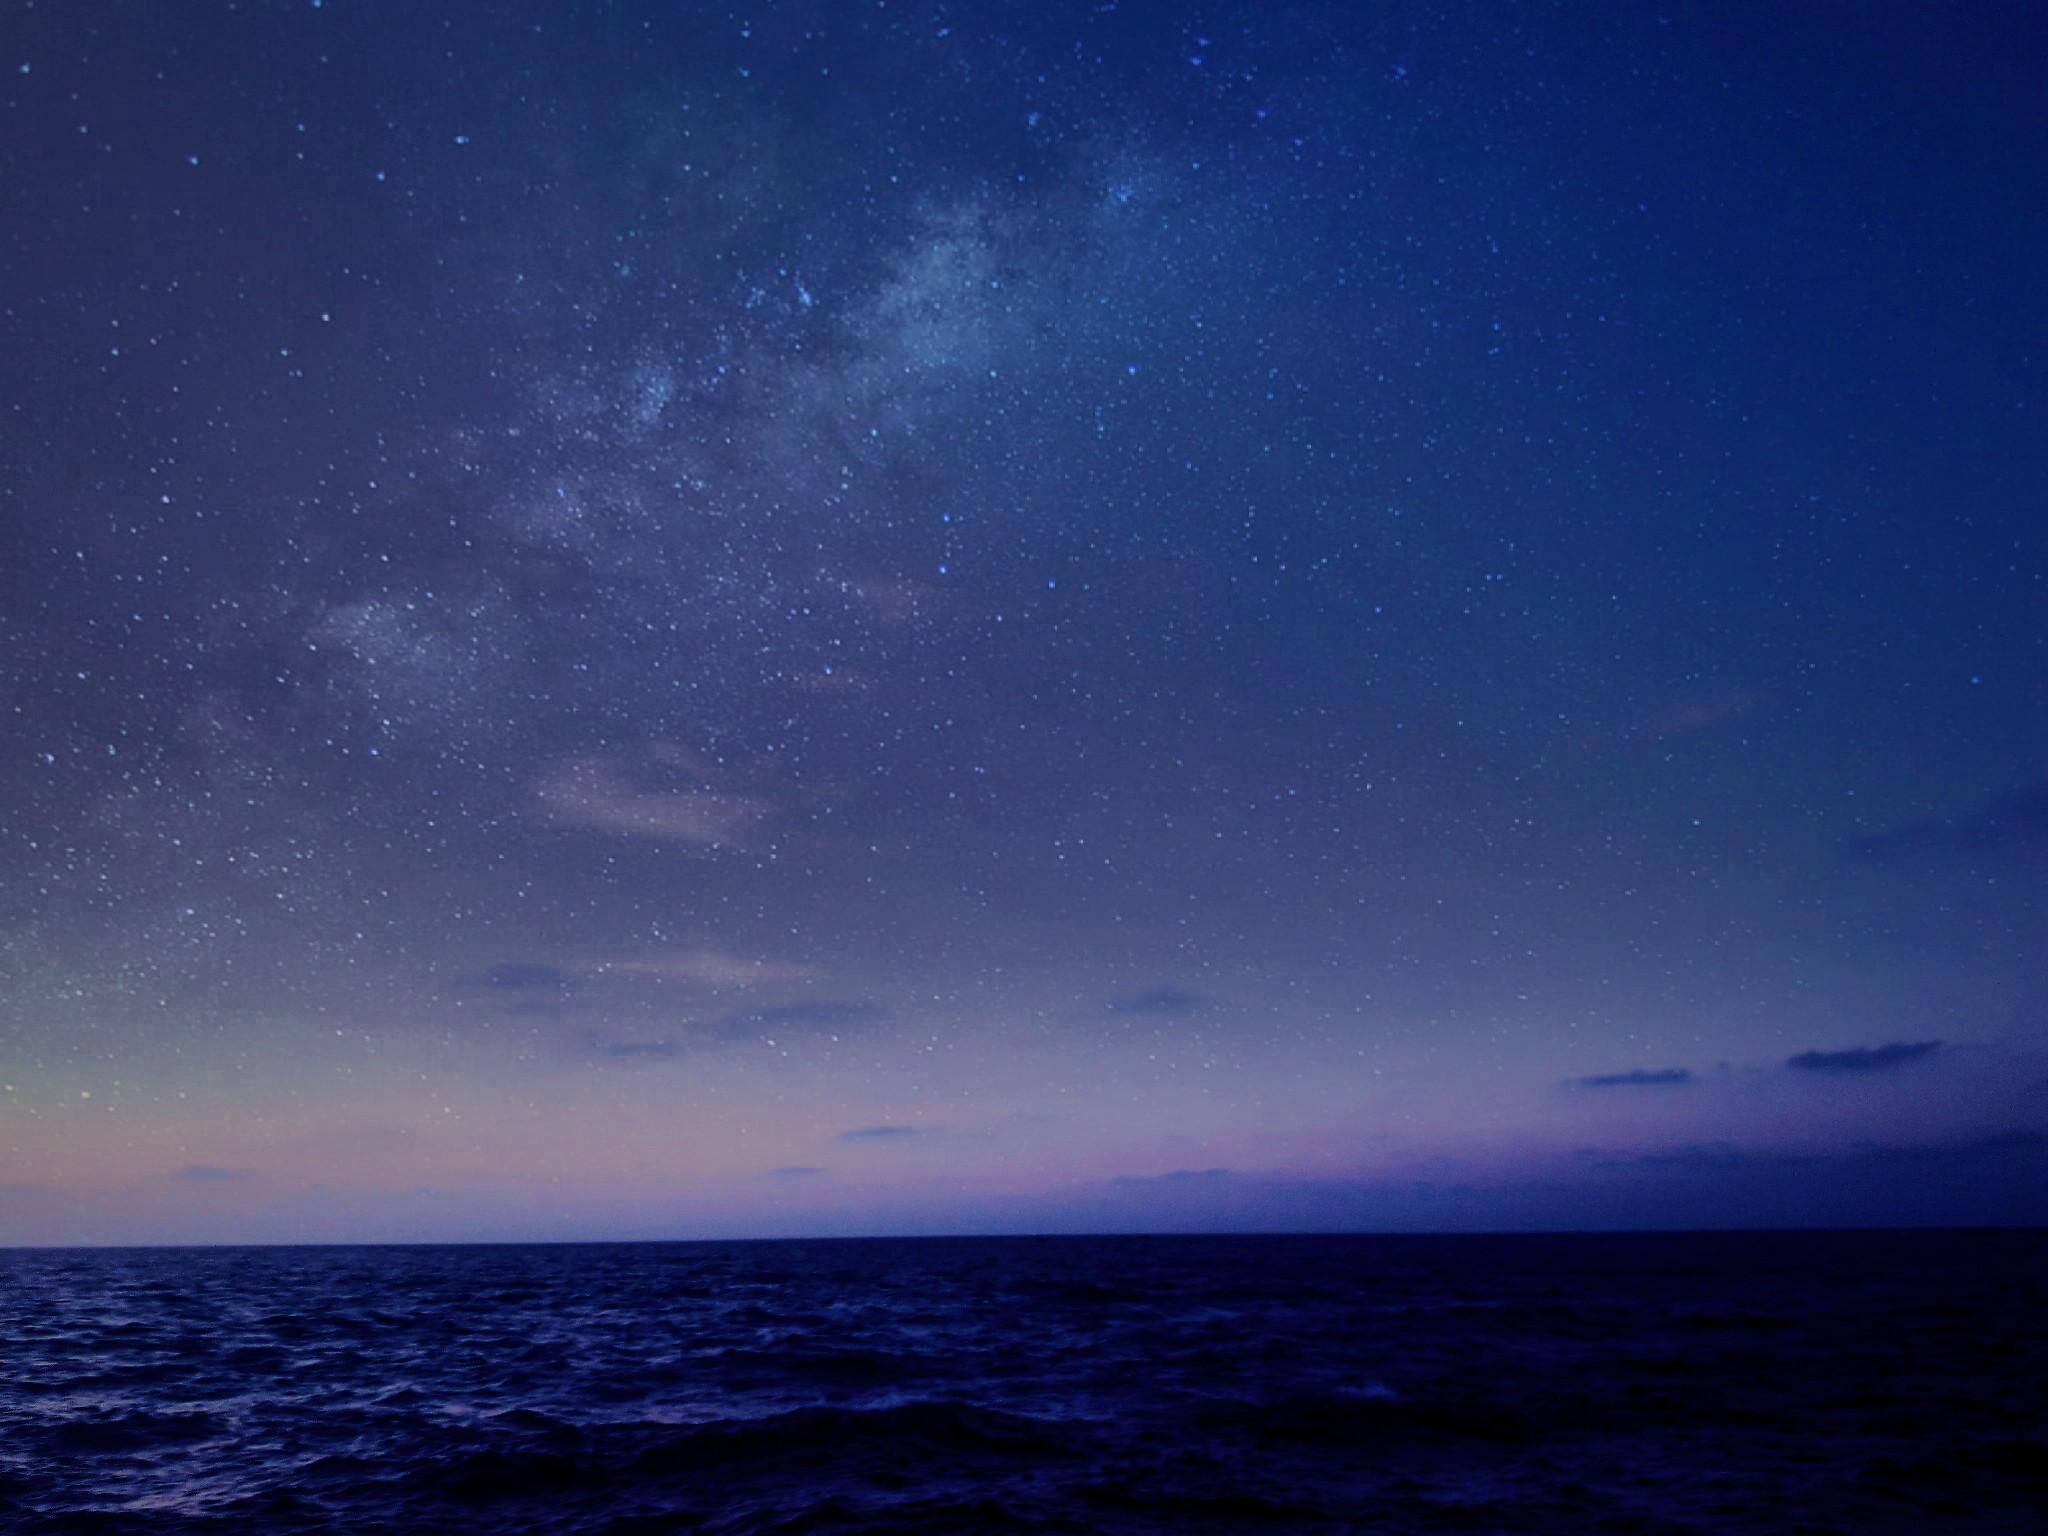 dark blue sky with - photo #36